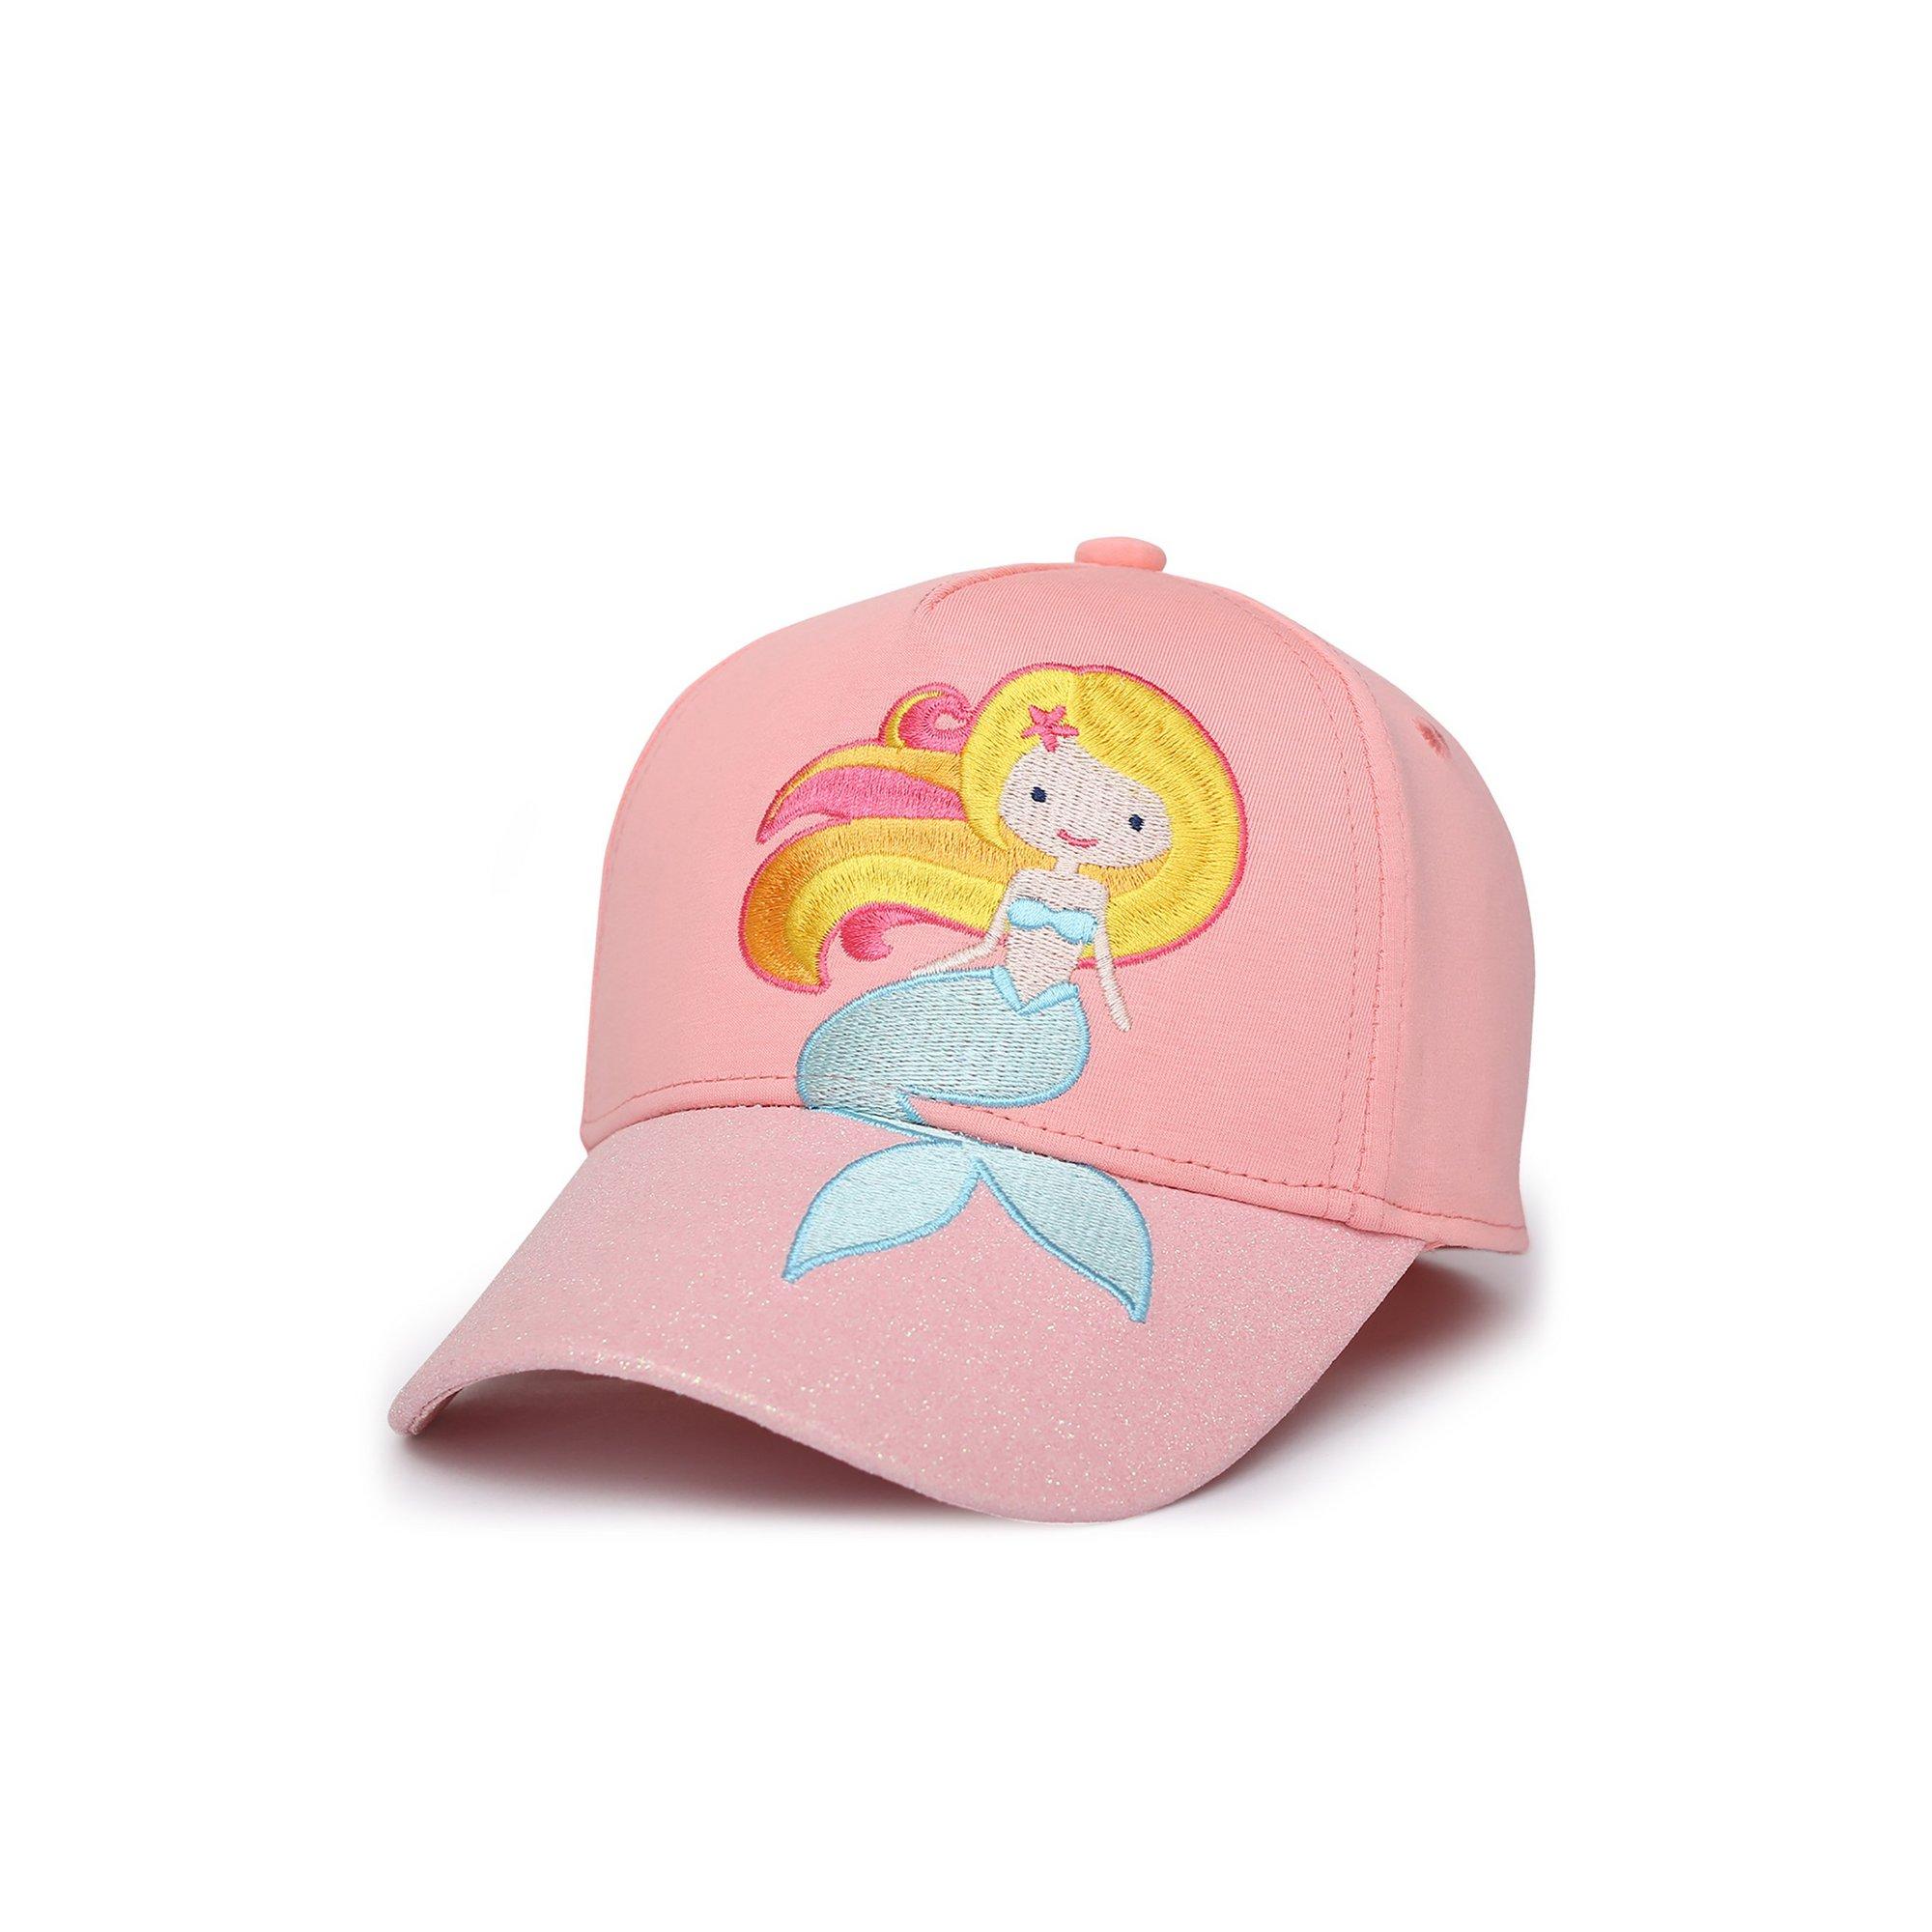 Image of FlapJackKids Ball Cap - Mermaid